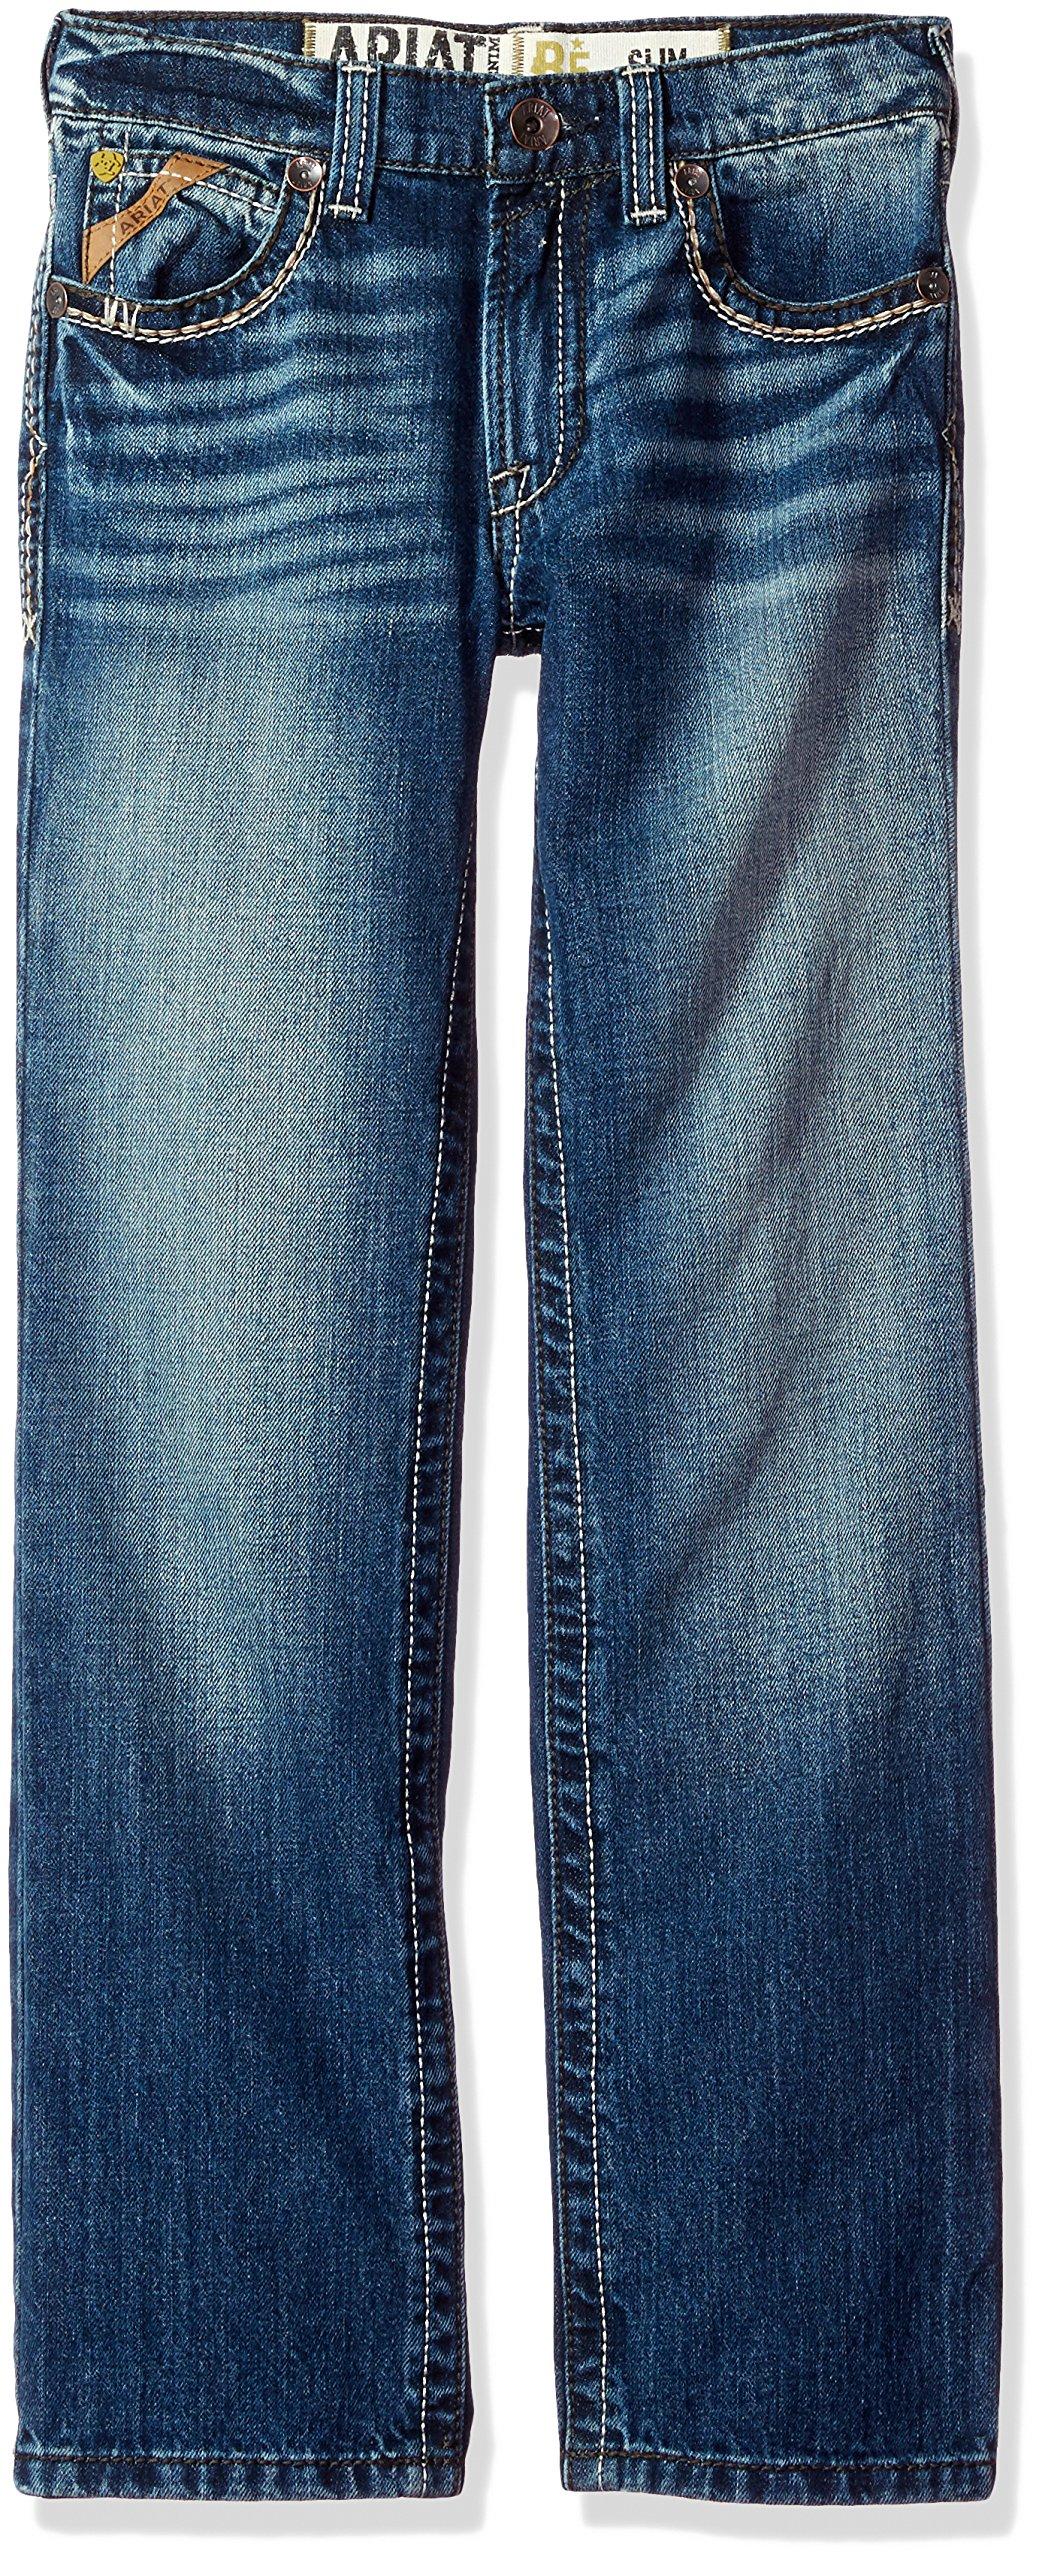 Ariat Boys' B5 Slim Fit Straight Leg Jean, Davis Bayfront, 10 Boys